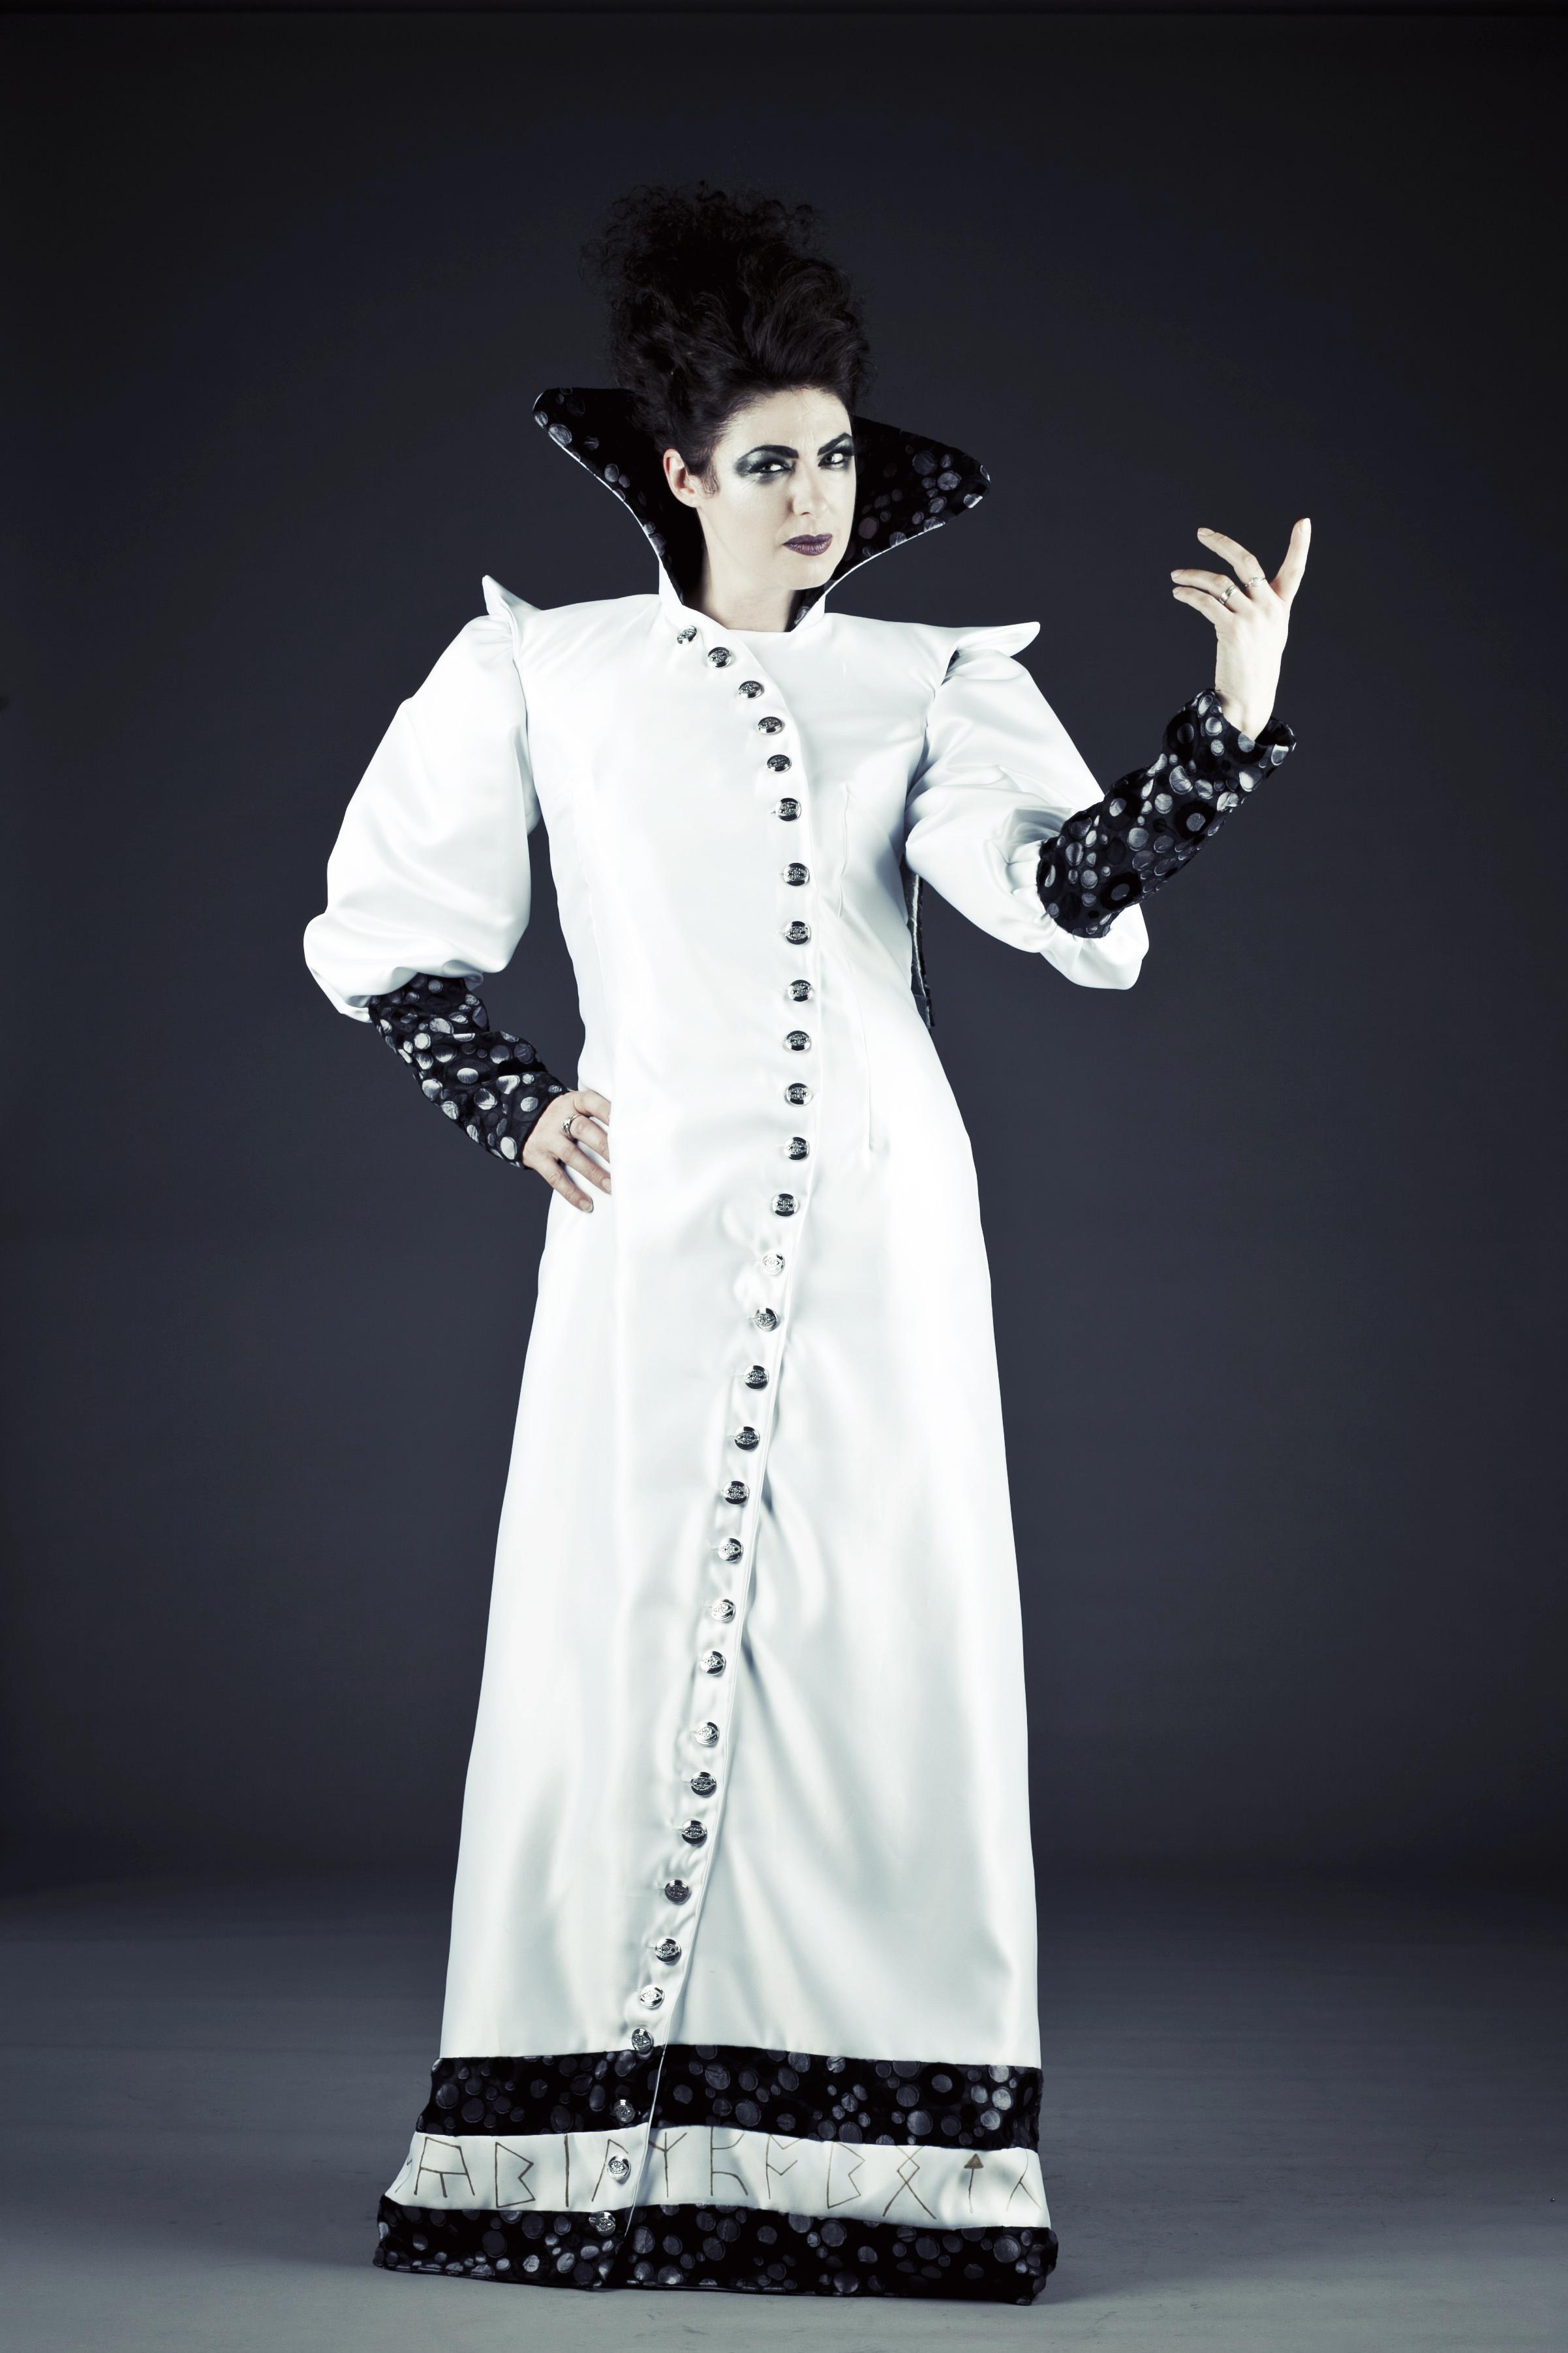 Sybil costume design